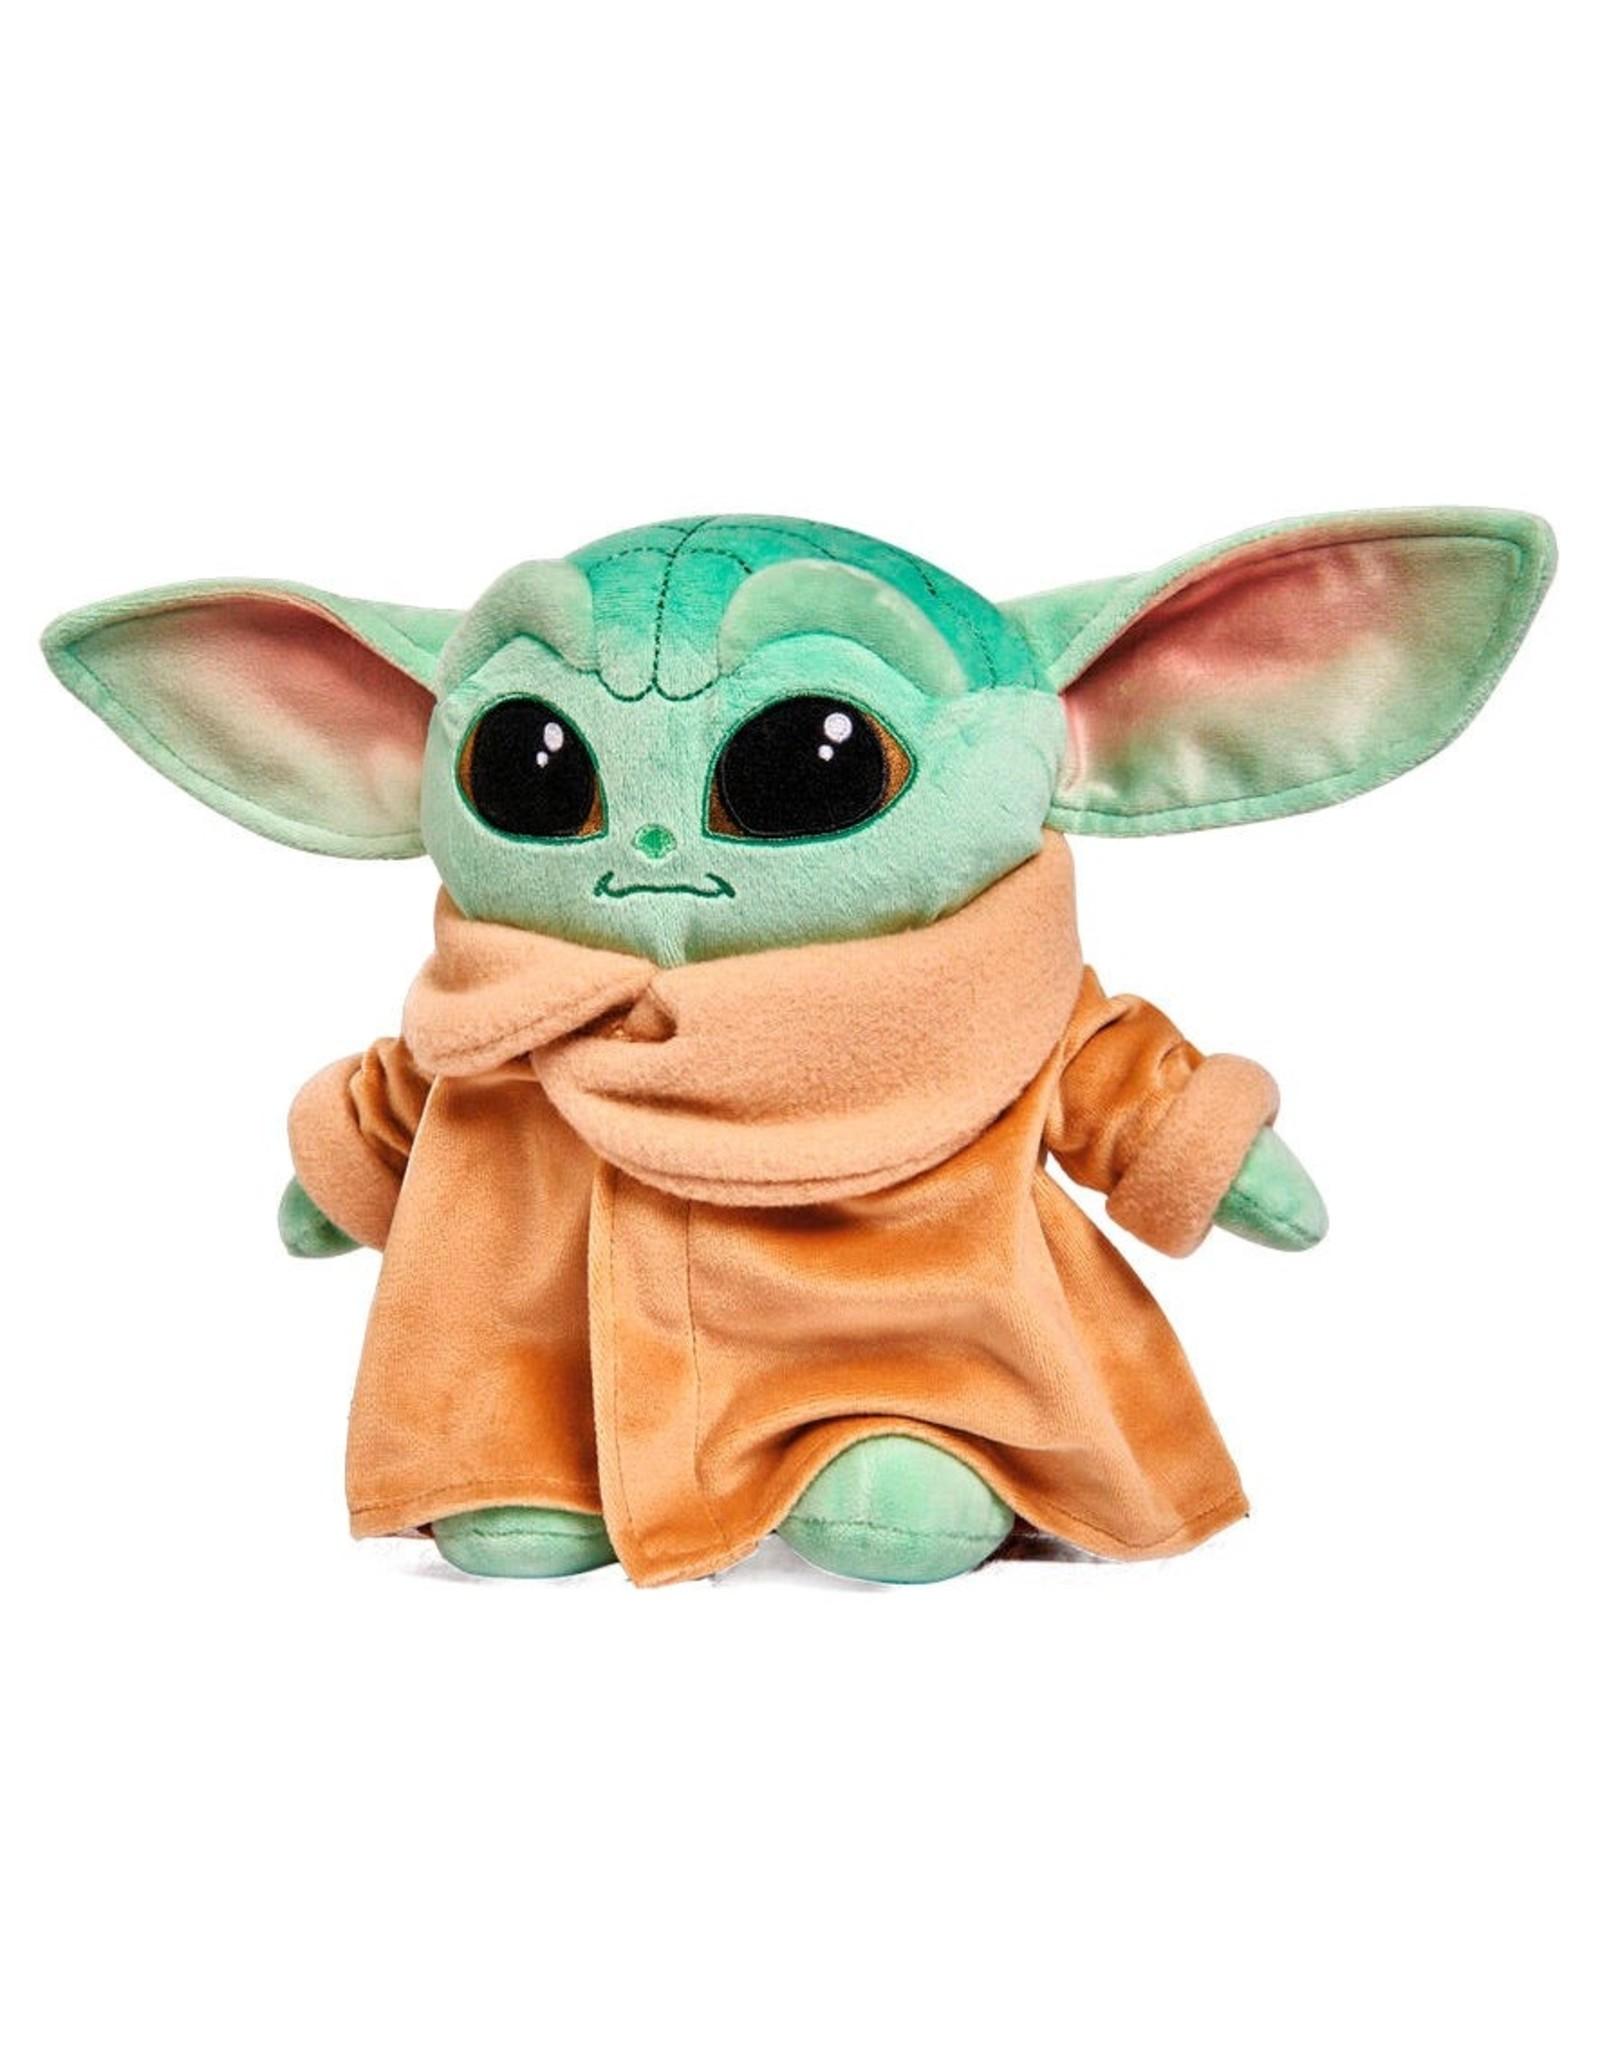 Disney Merchandise plush and figurines - Baby Yoda plush 25cm